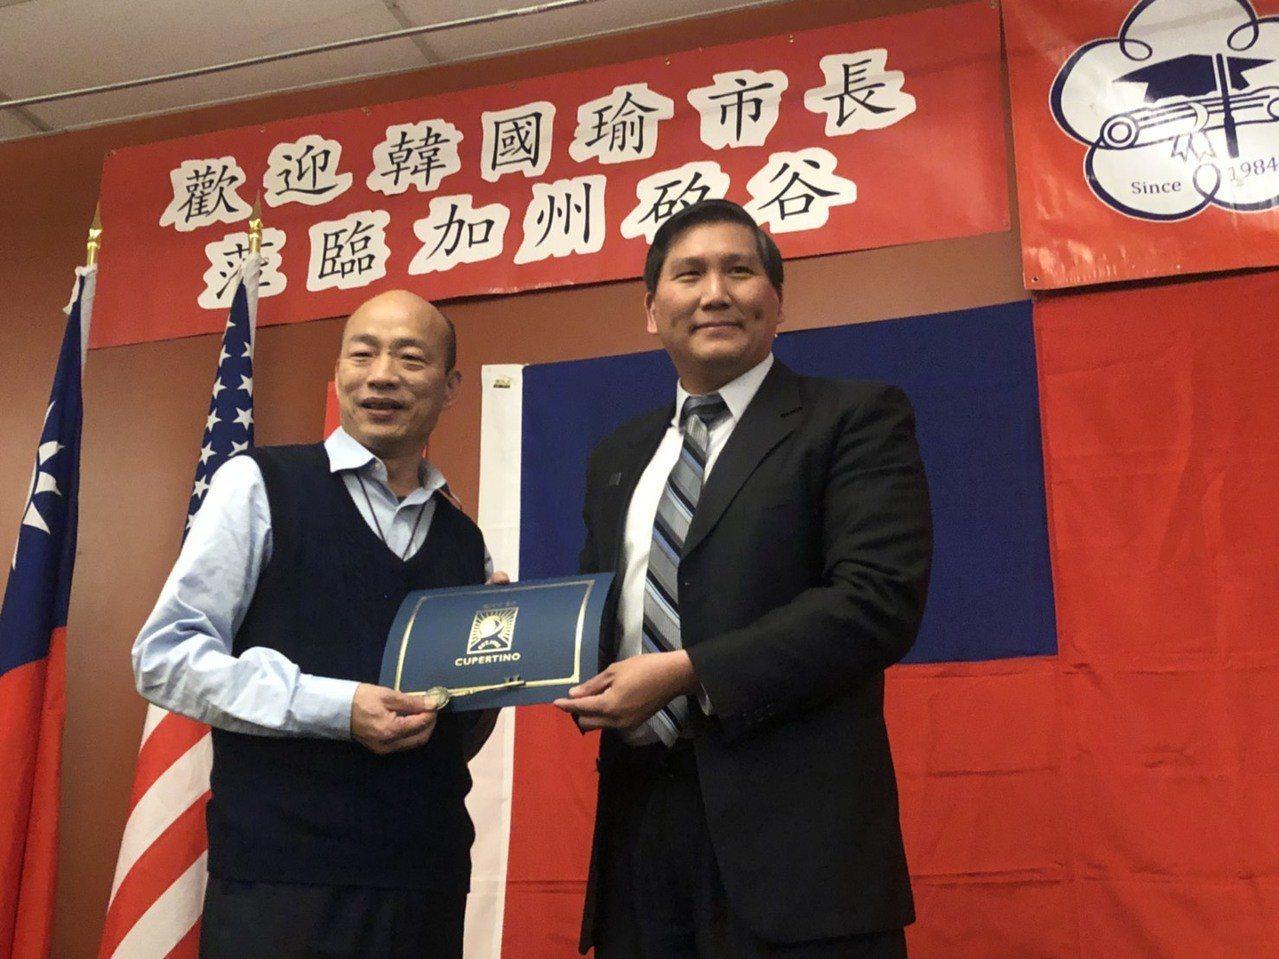 Cupertino庫柏提諾市的前市長、華裔現任市議員Darcy Paul蒲仲辰,...